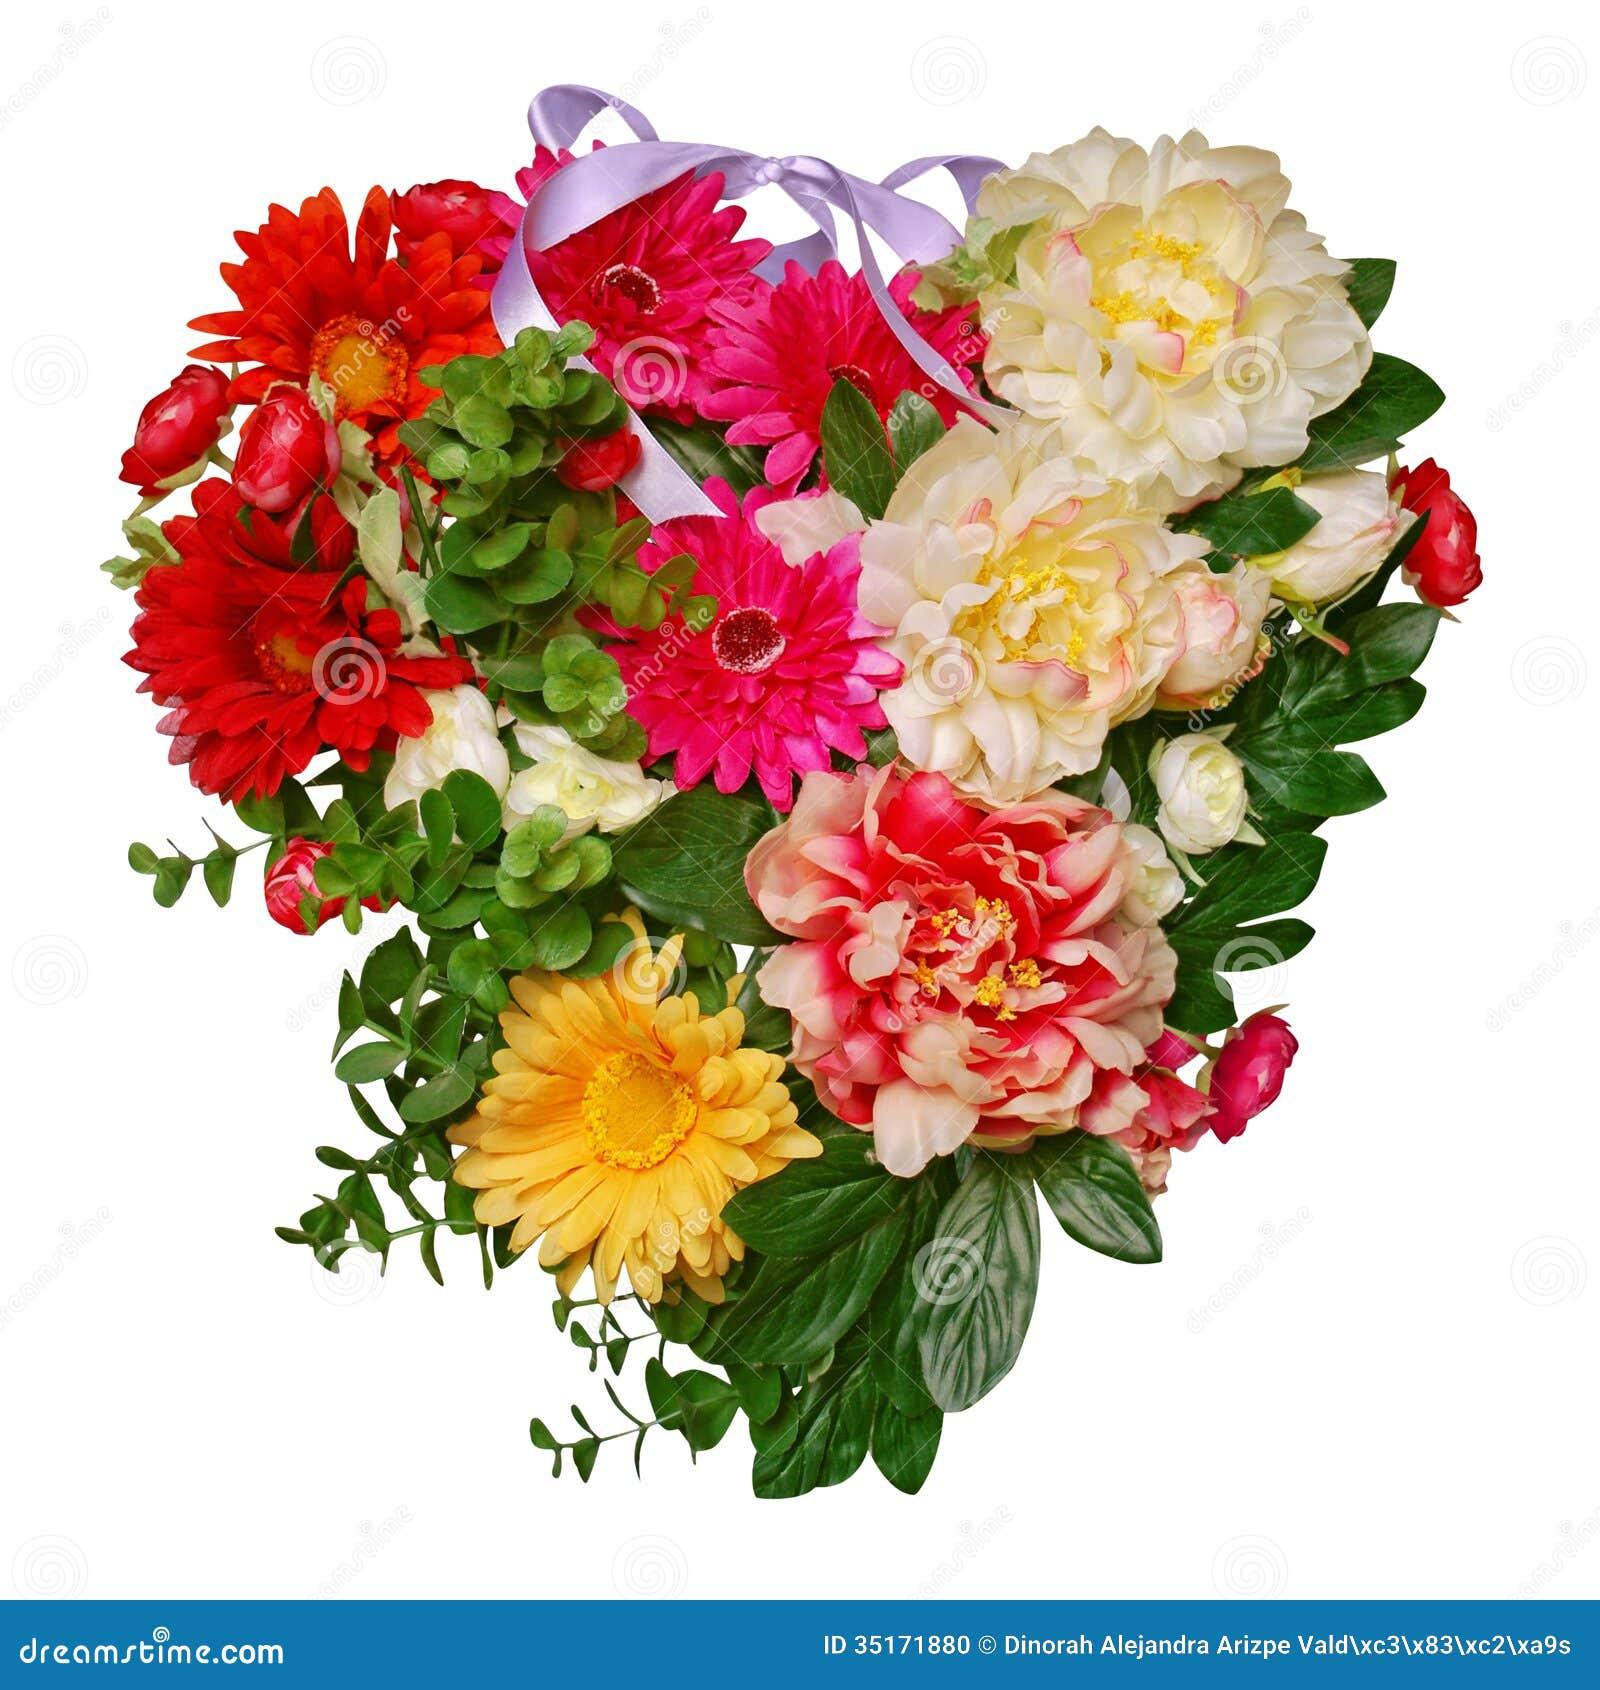 Heart Of Flowers Stock Photo Image Of Romantic White 35171880